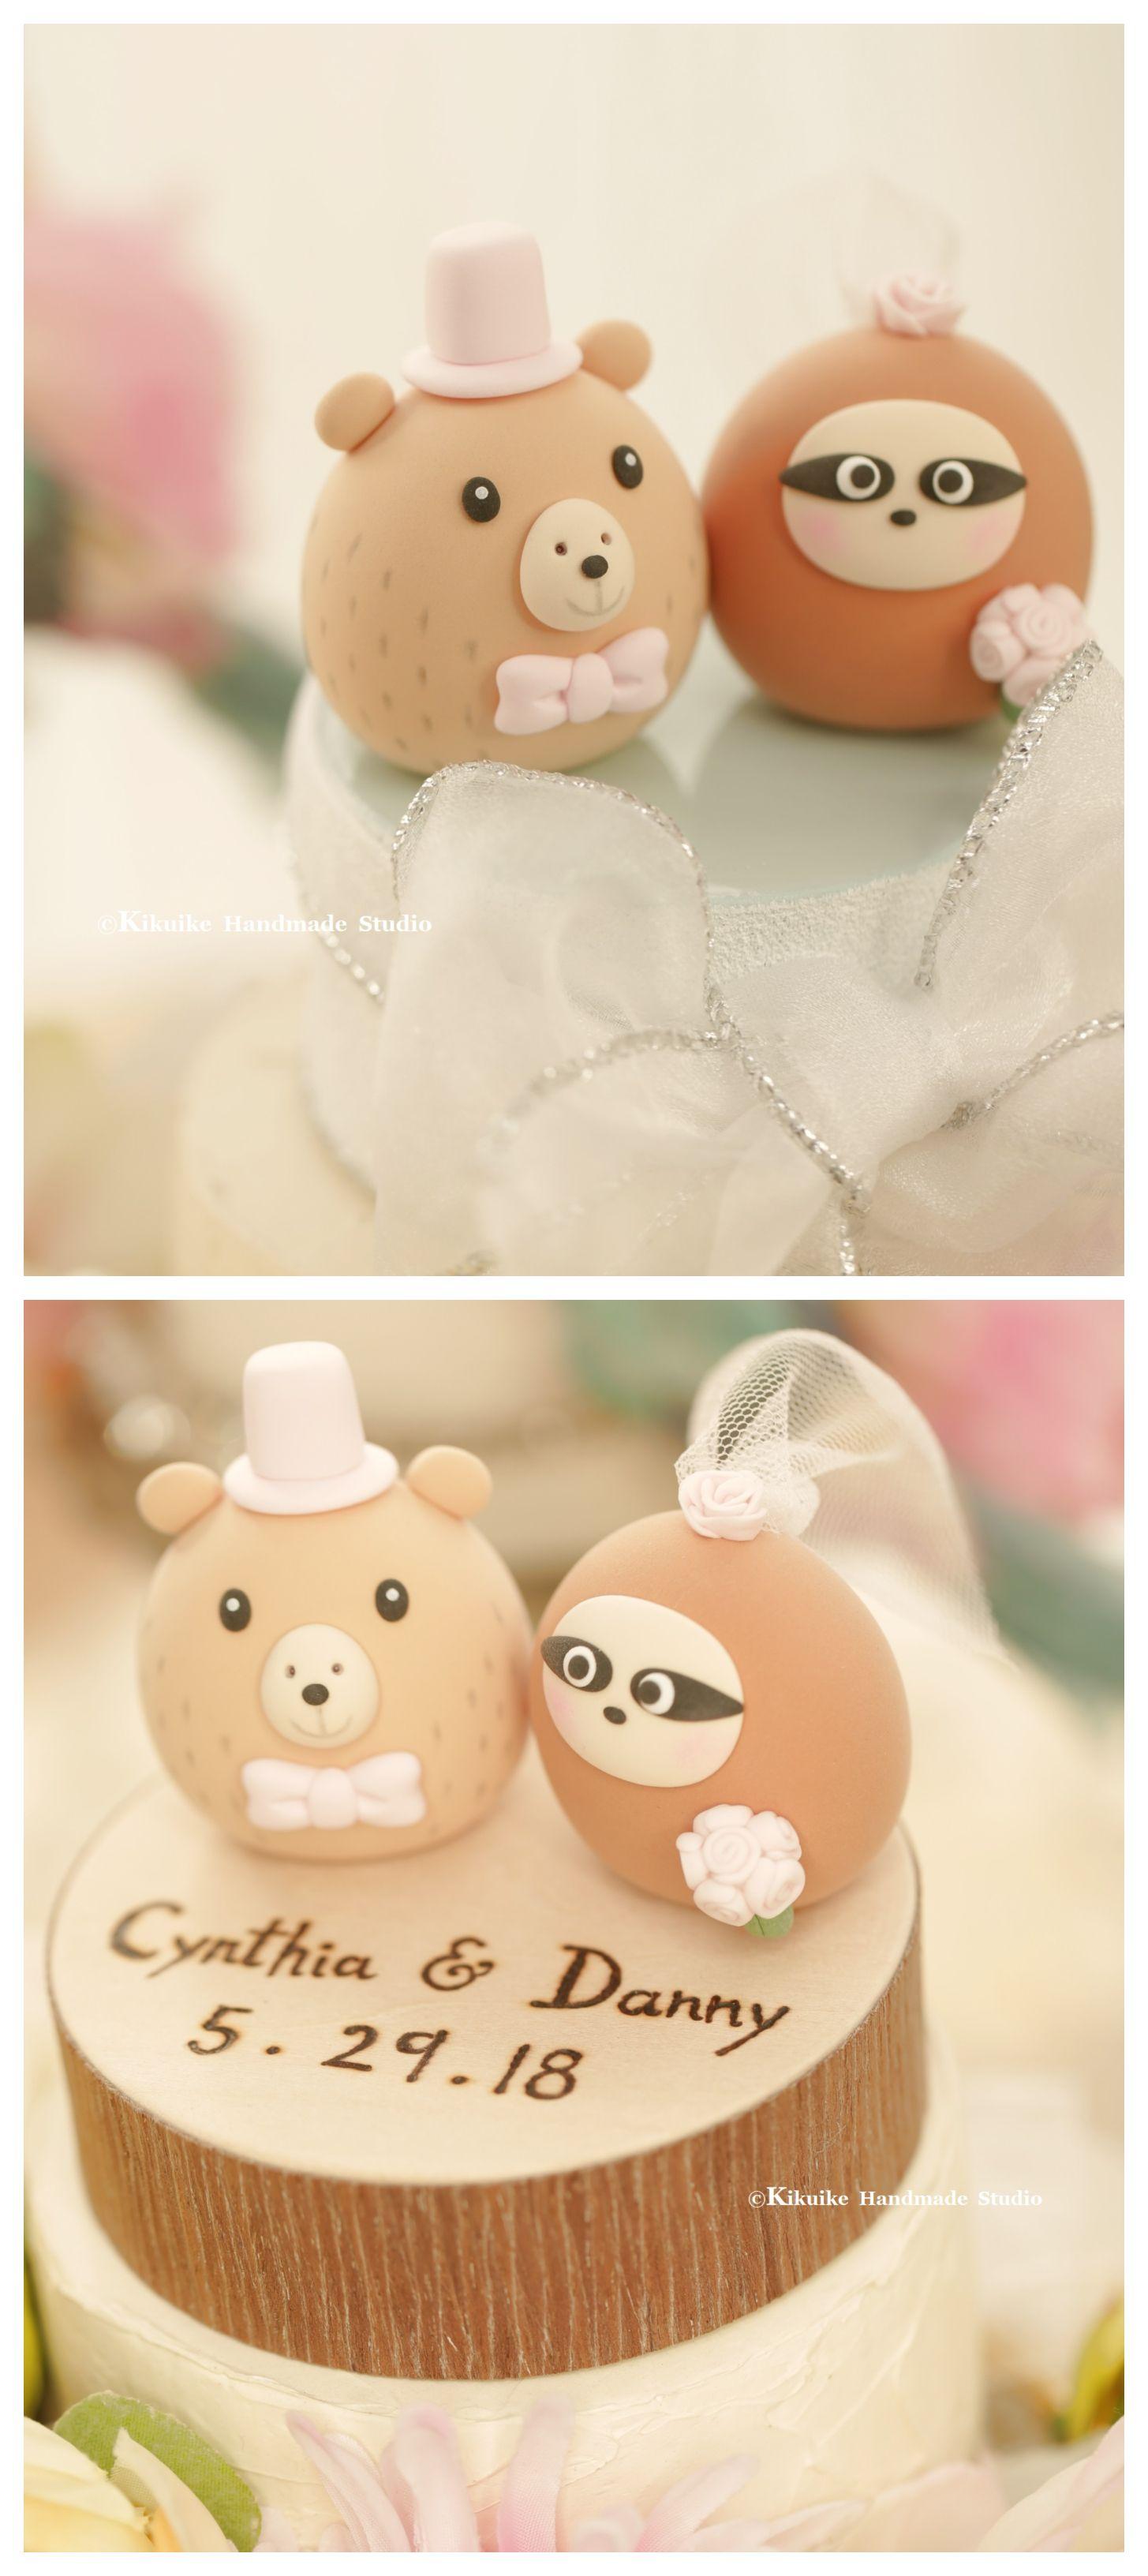 Handmade Capybara And Sloth Bride Groom Mochiegg Wedding Cake Topper Cute Animals Decoration Ideas Weddingplanning Weddingideas